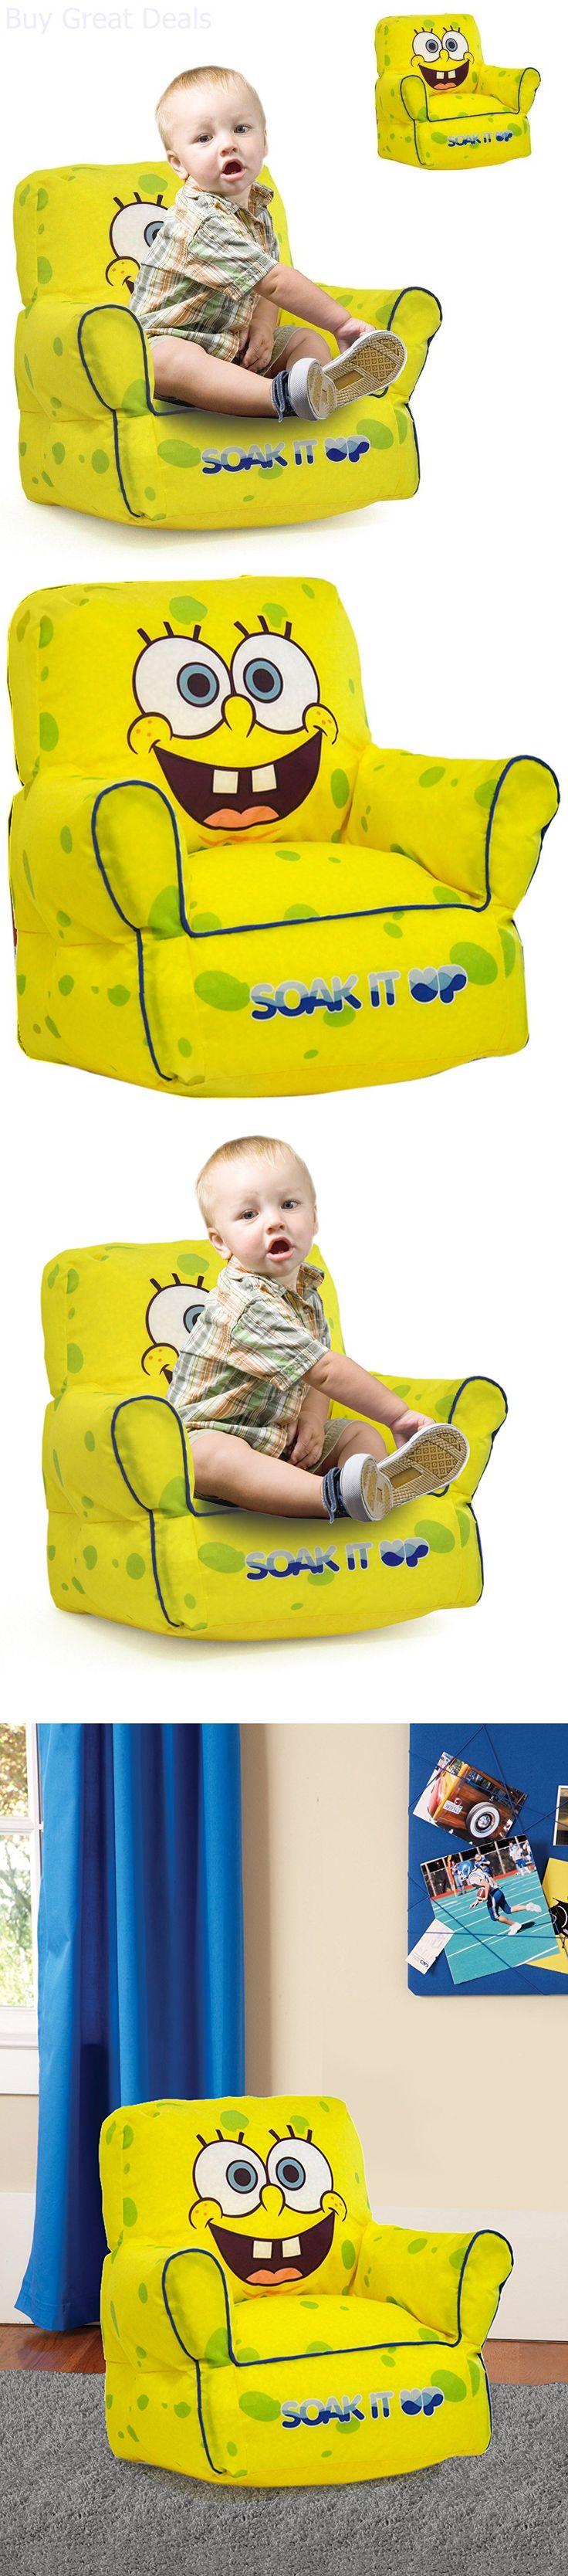 SpongeBob Squarepants 20919: Bean Bag Spongebob Squarepants Soak It Up Toddler Lounge Kids Sofa Chair -> BUY IT NOW ONLY: $35.14 on eBay!